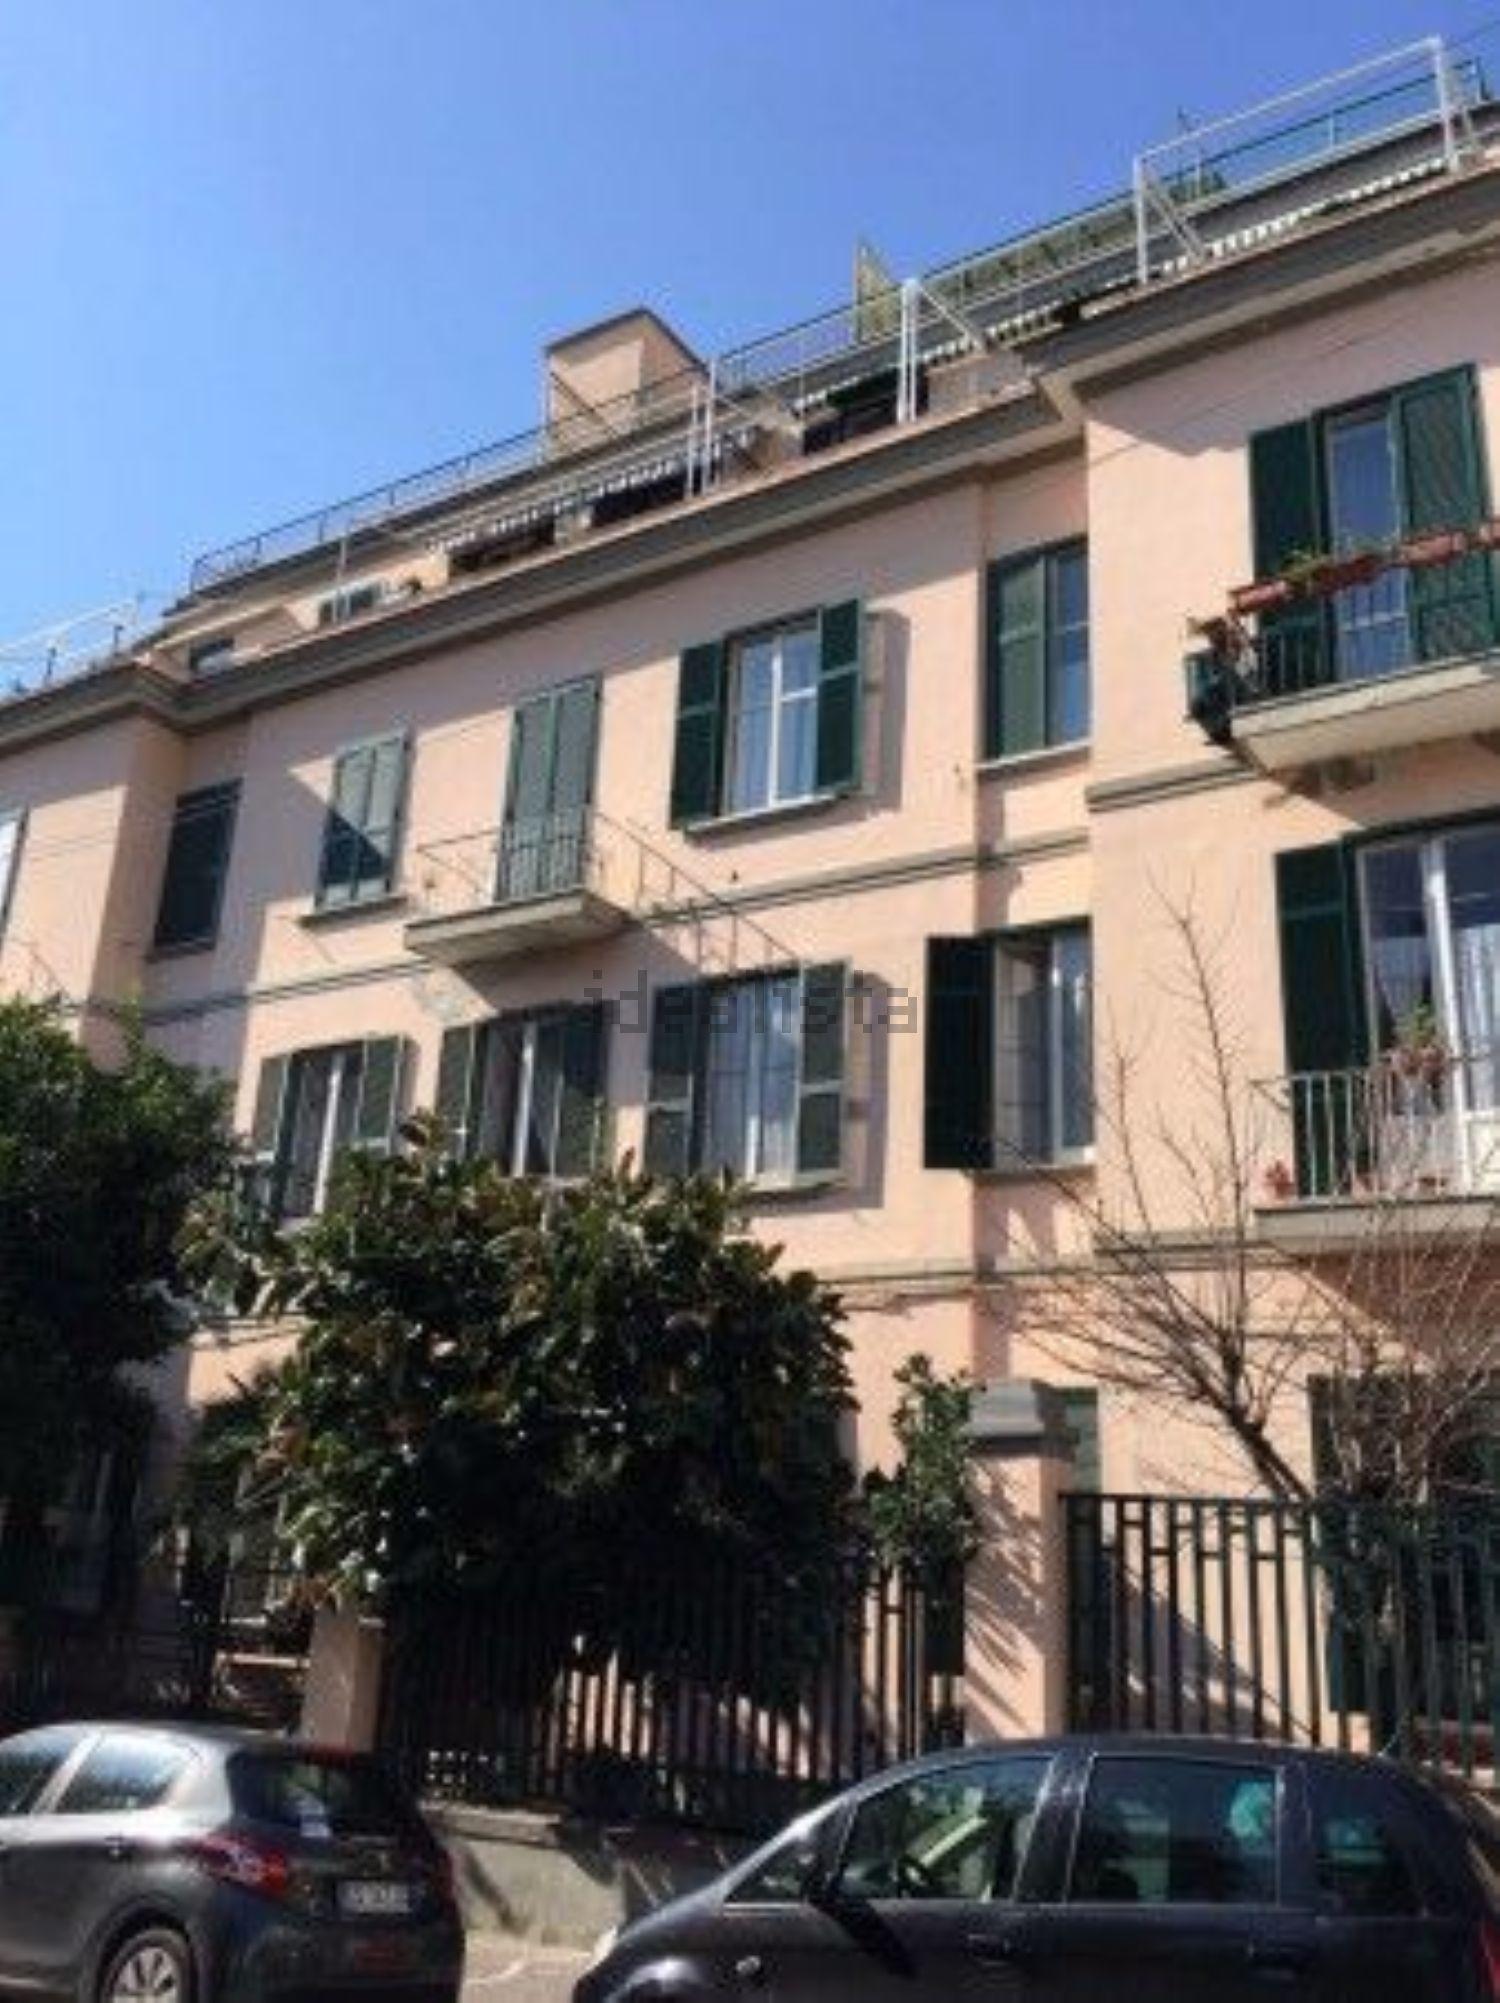 Annunci di case in vendita Casoria su Bakeca